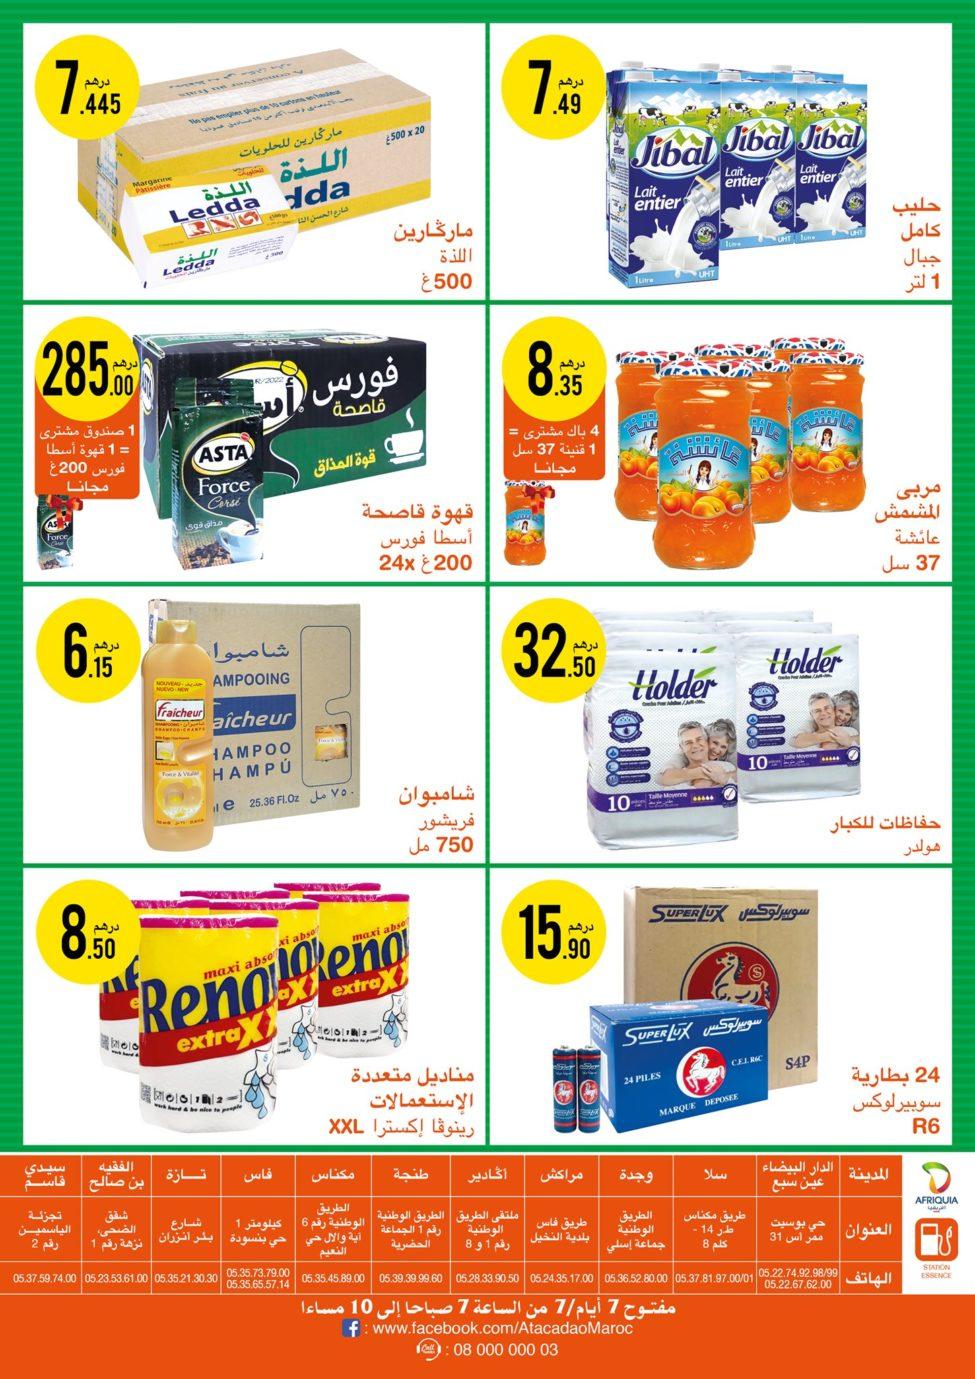 Catalogue Atacadao Maroc du 24 Juin au 10 Juillet 2019